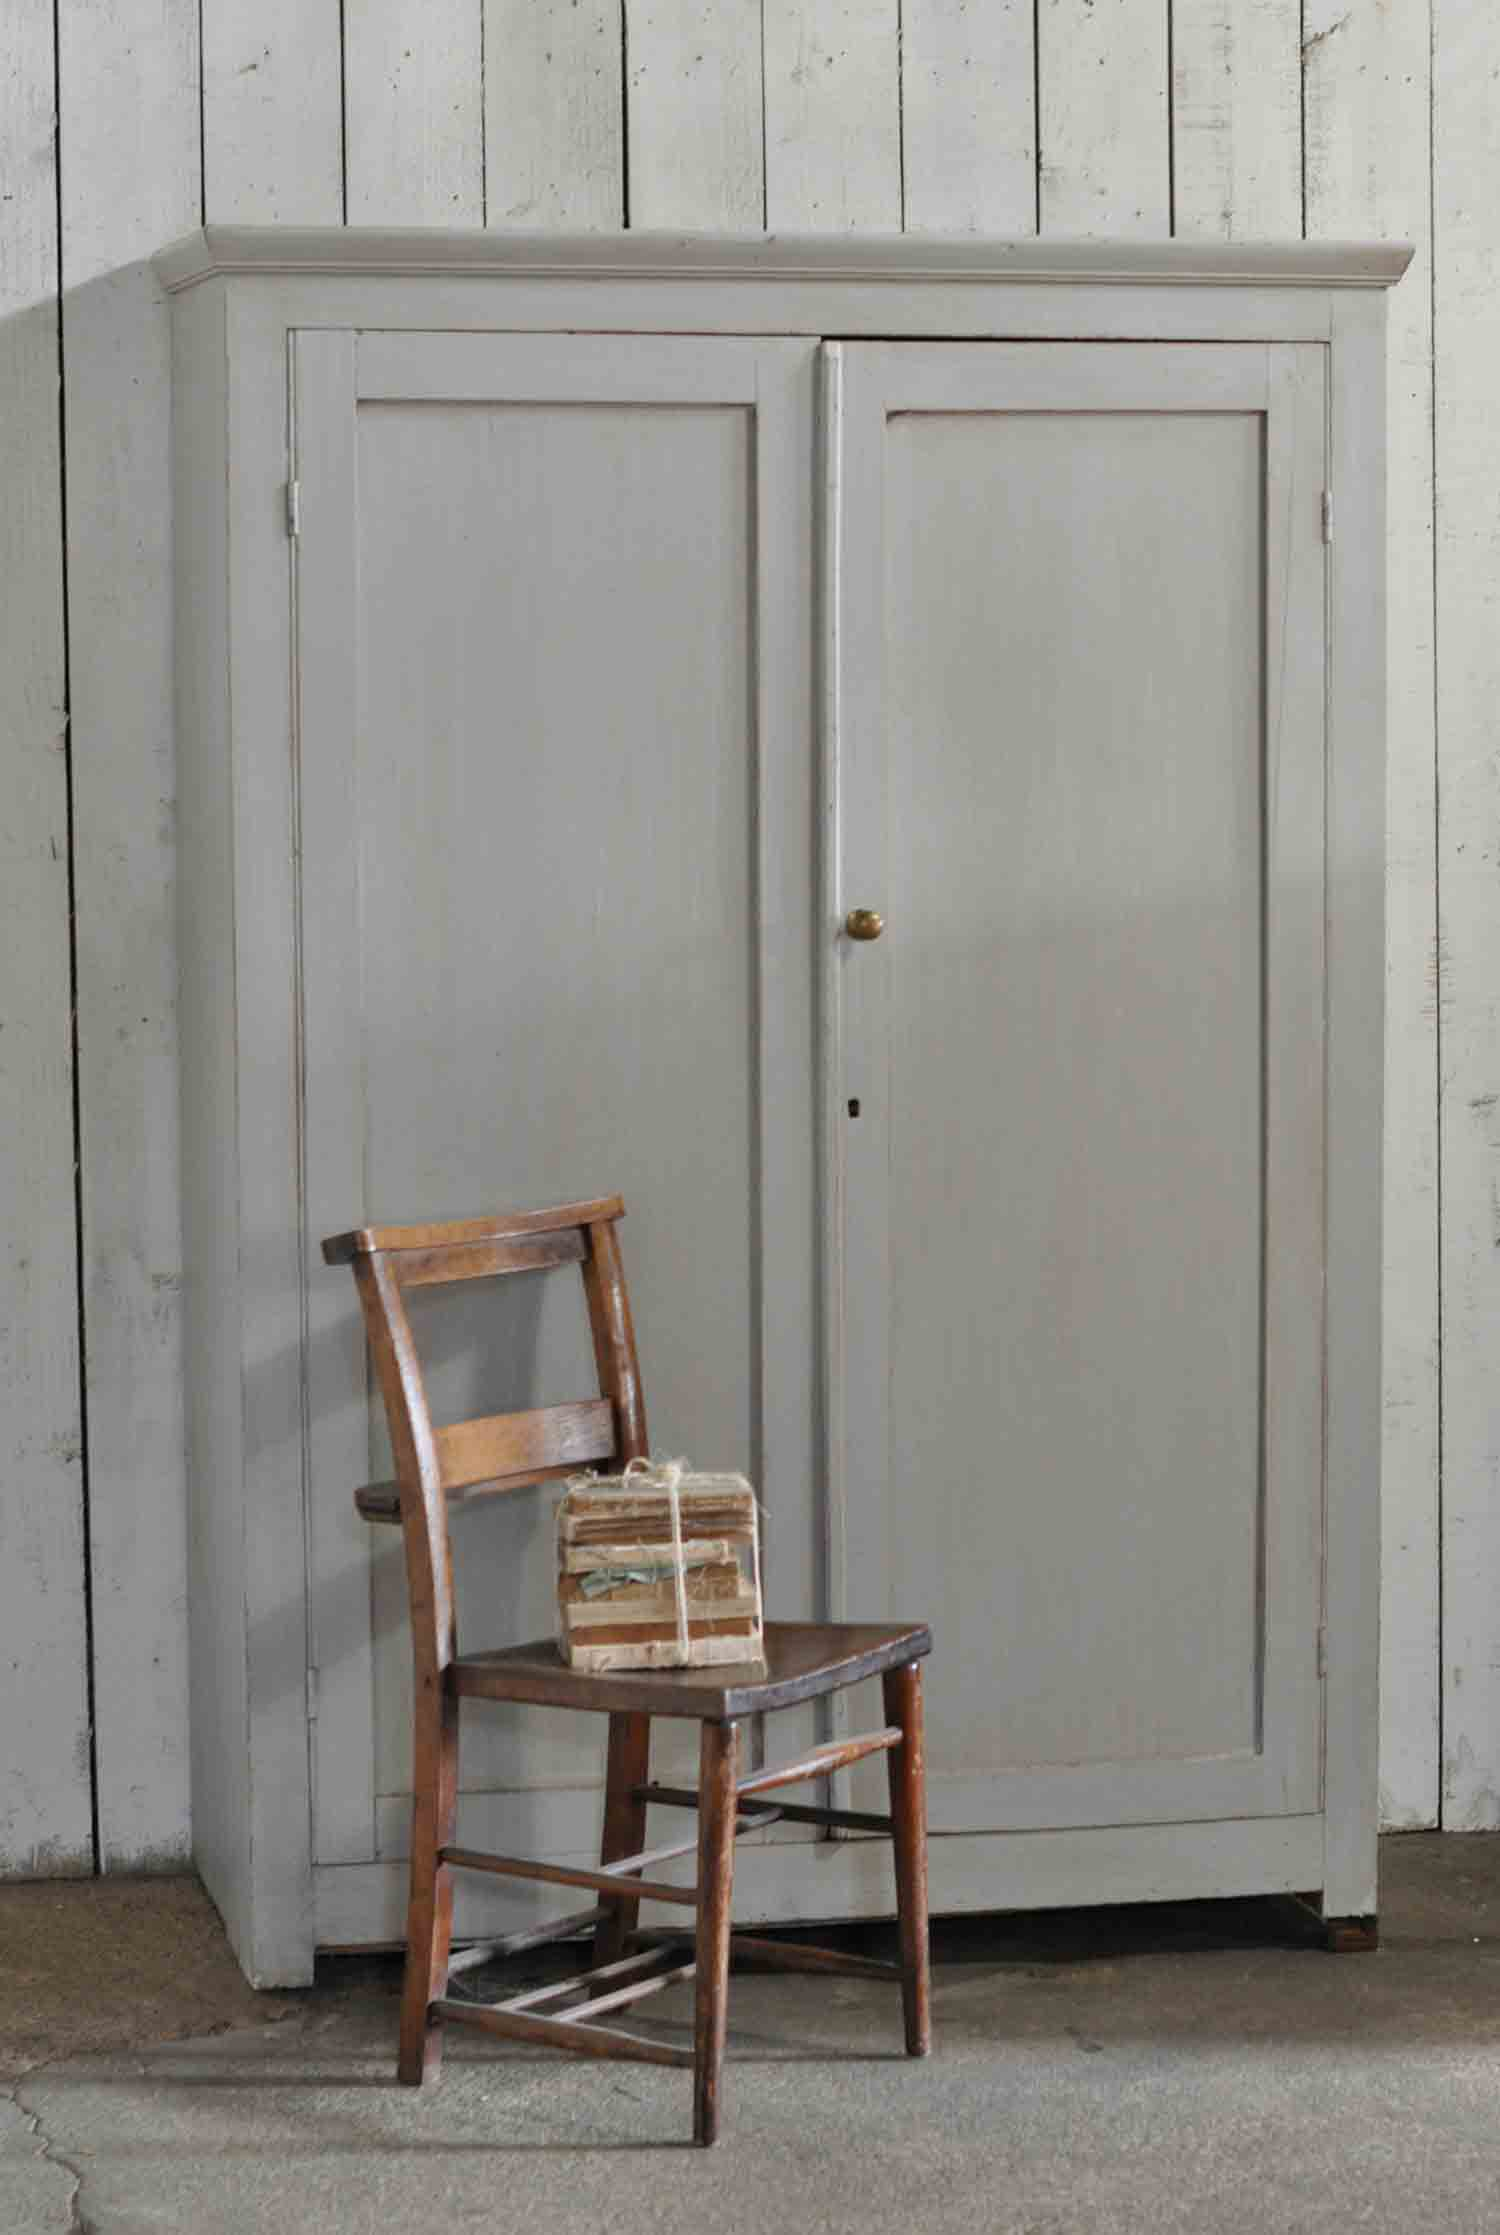 Vintage Painted Two Door School Cupboard Shelves Home